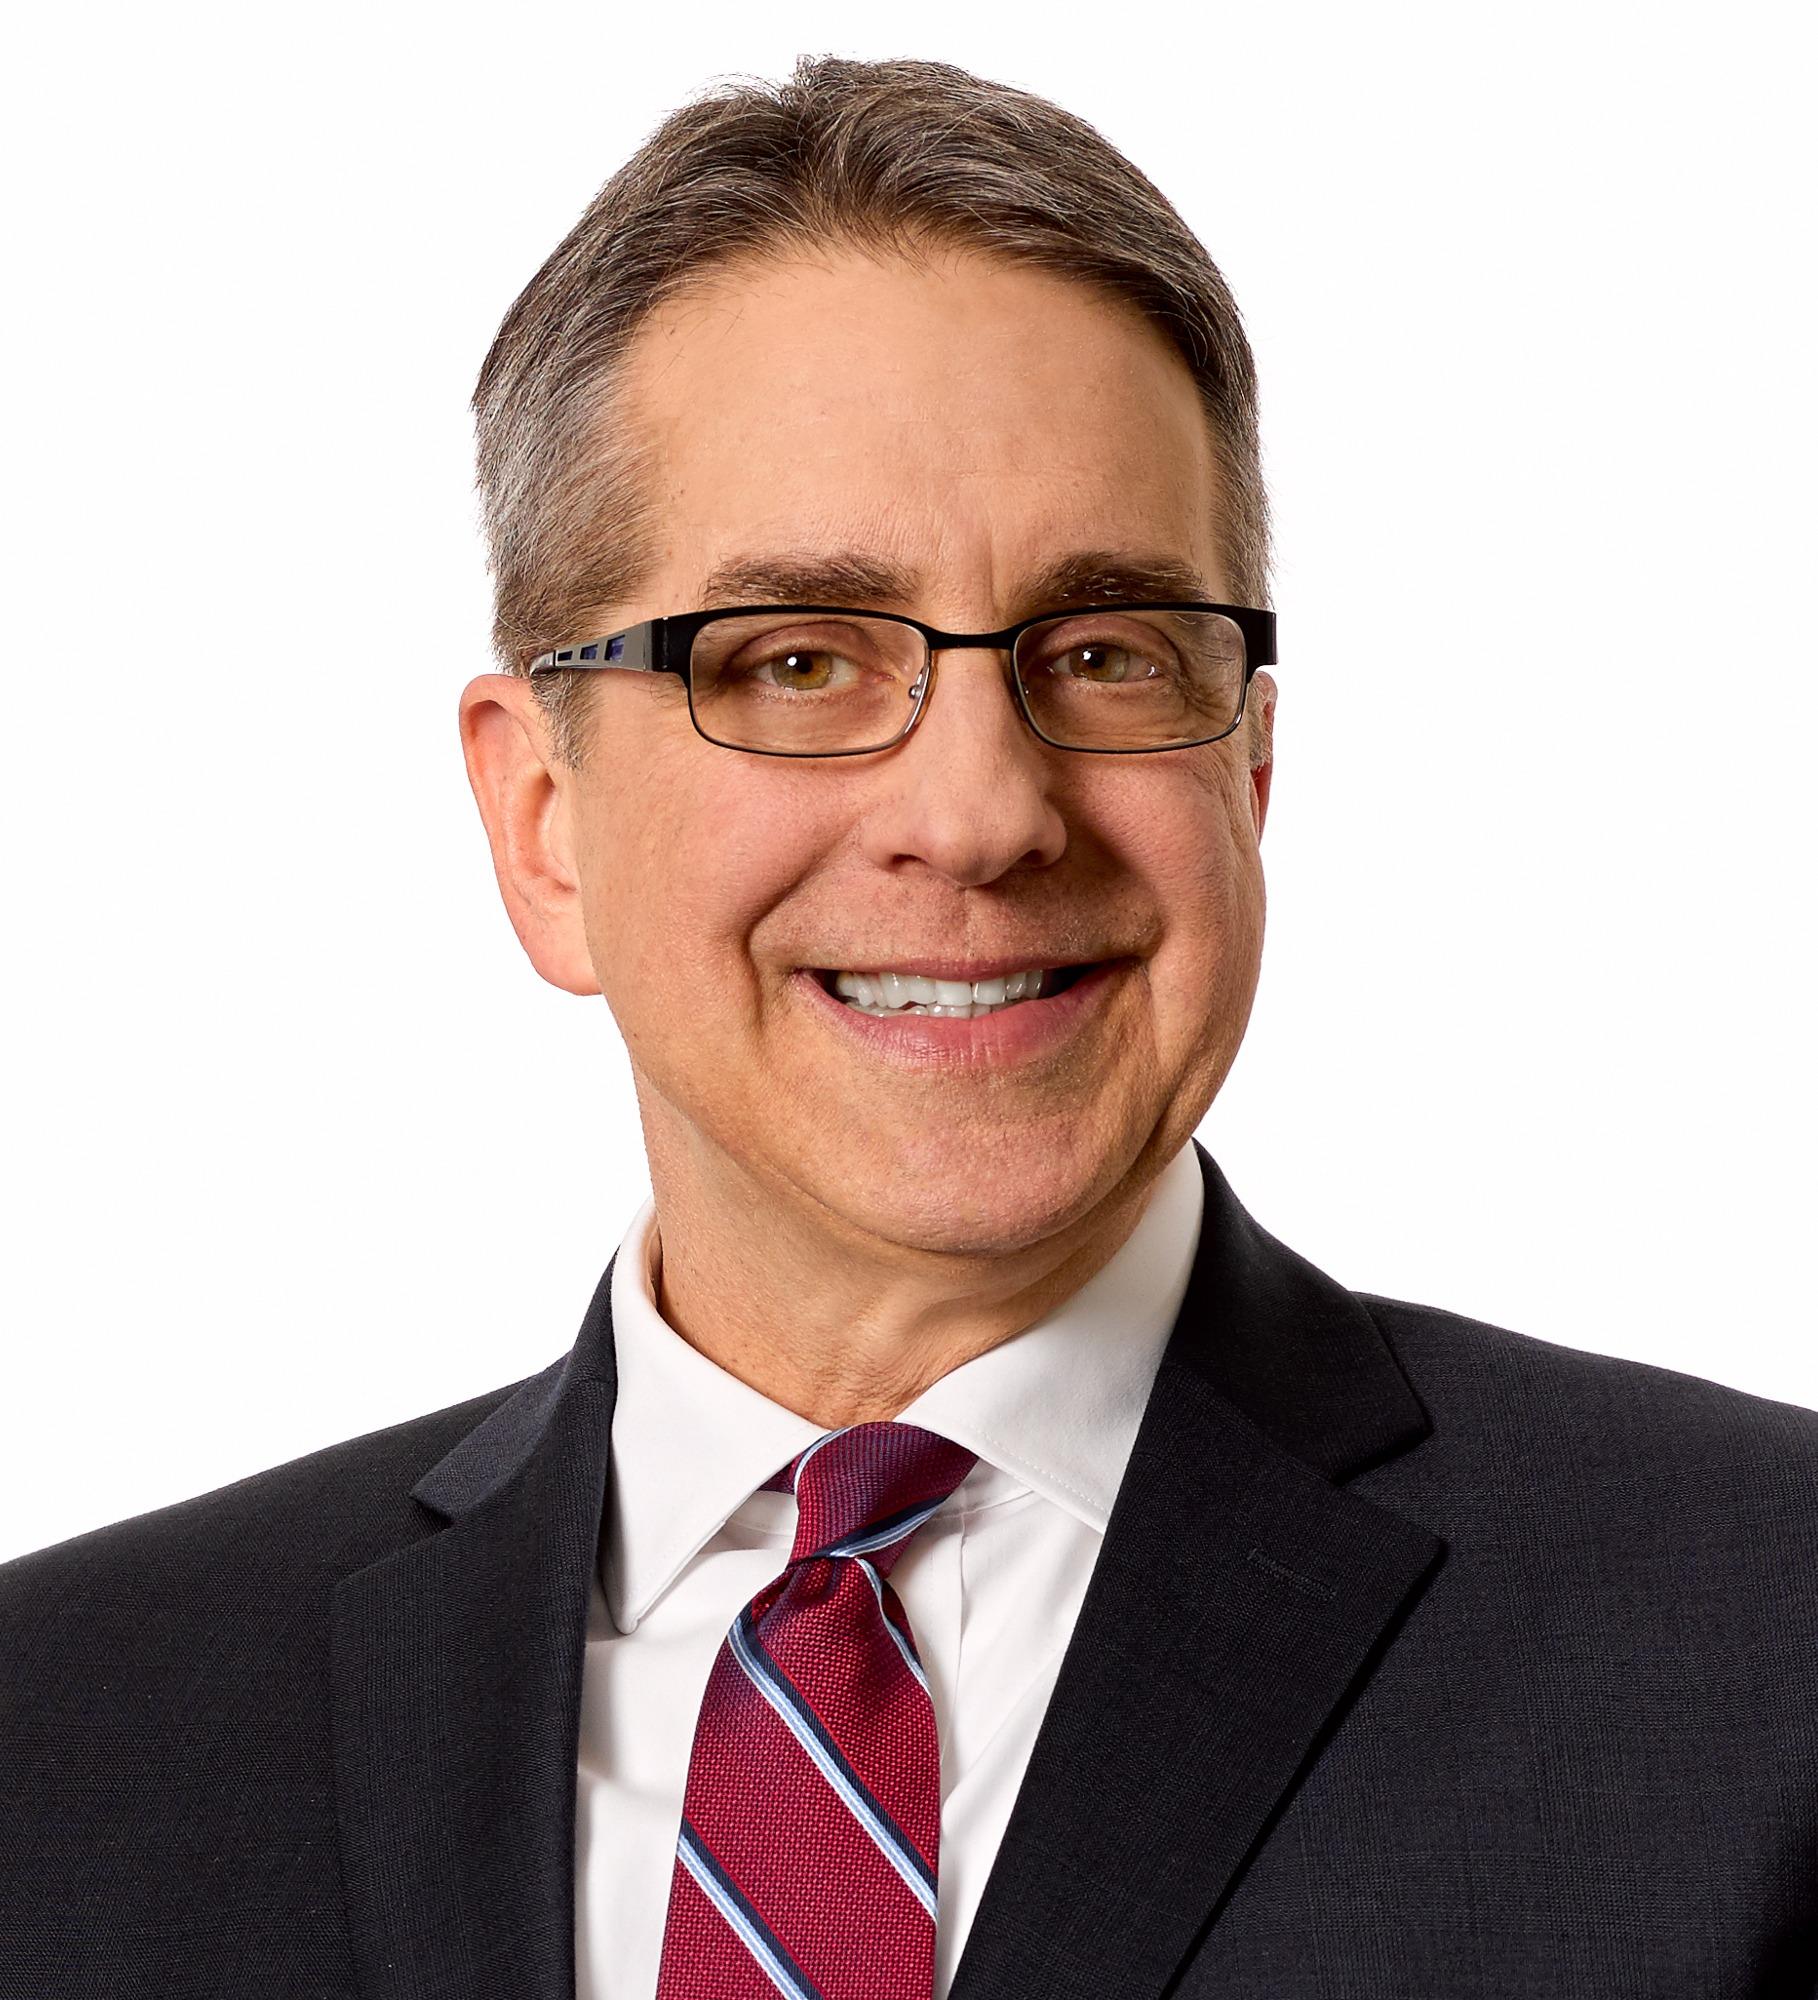 Paul Cieslik's Profile Image